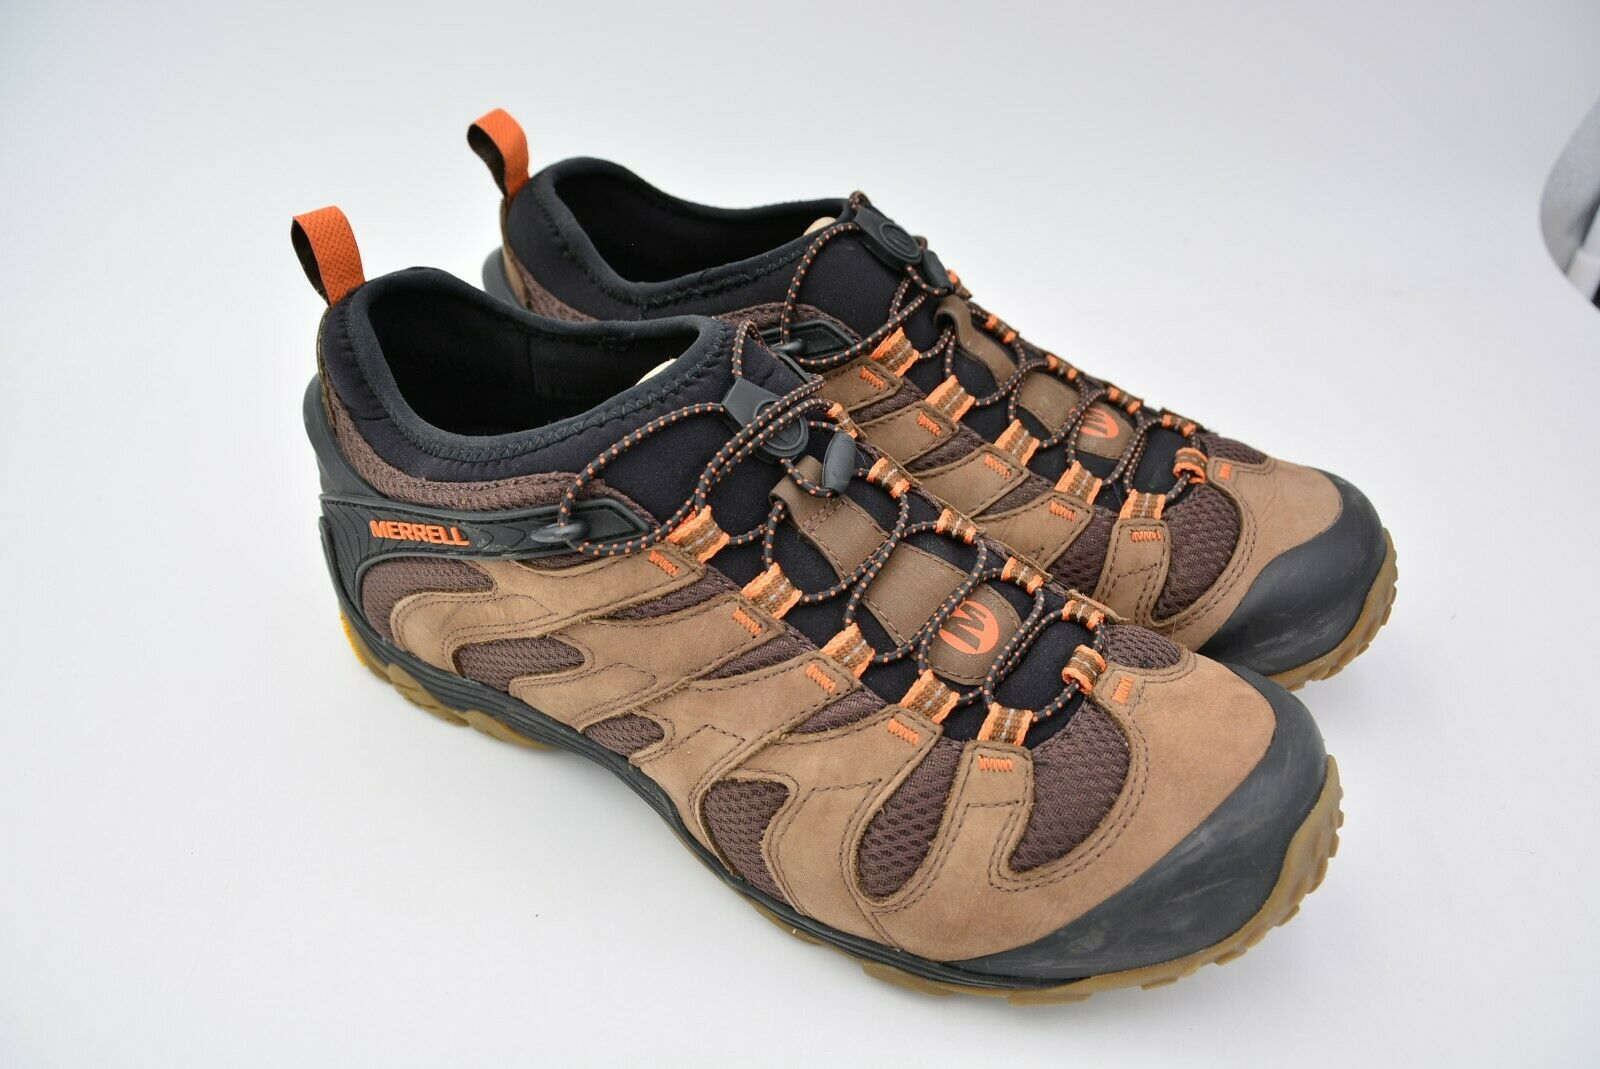 Merrell Para Hombre Zapato  Senderismo Chameleon 7 Stretch Dark Earth tamaño nos 13 UE 48 uesd  colores increíbles